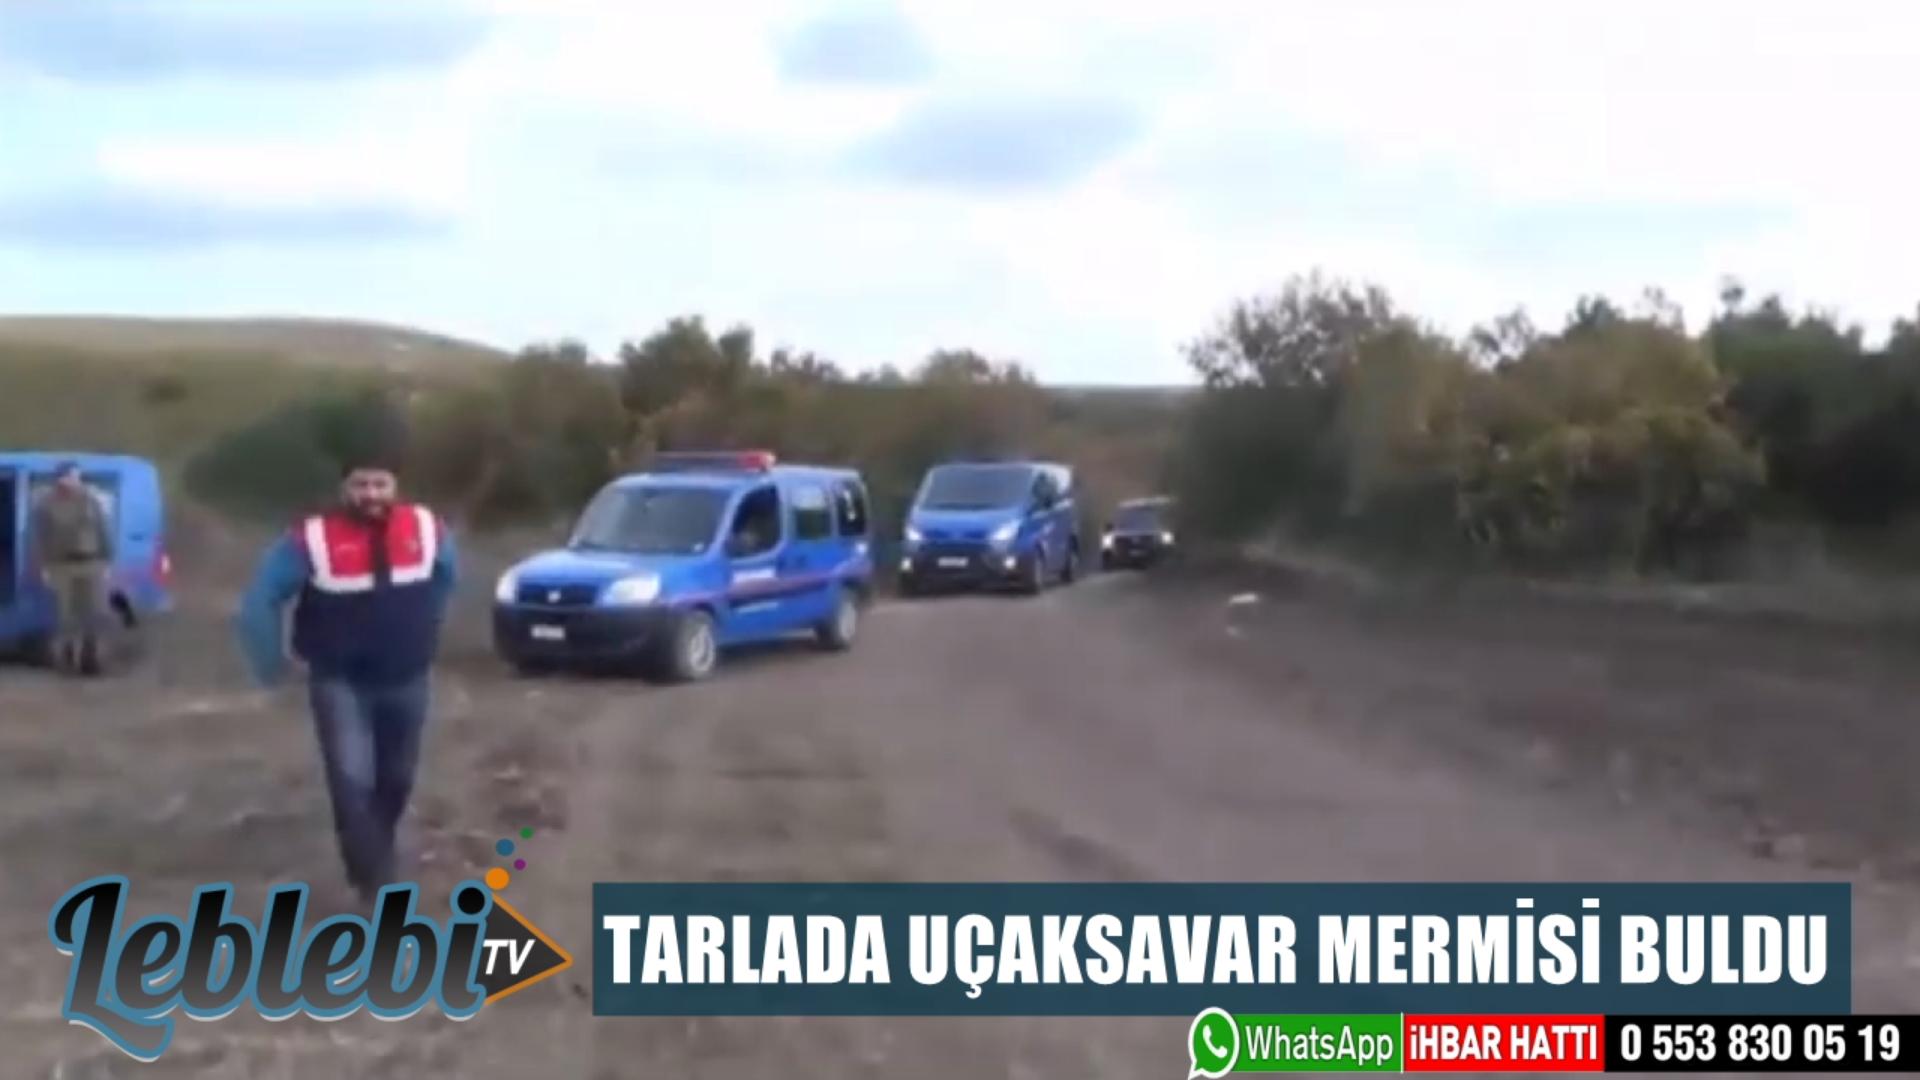 TARLADA UÇAKSAVAR MERMİSİ BULDU